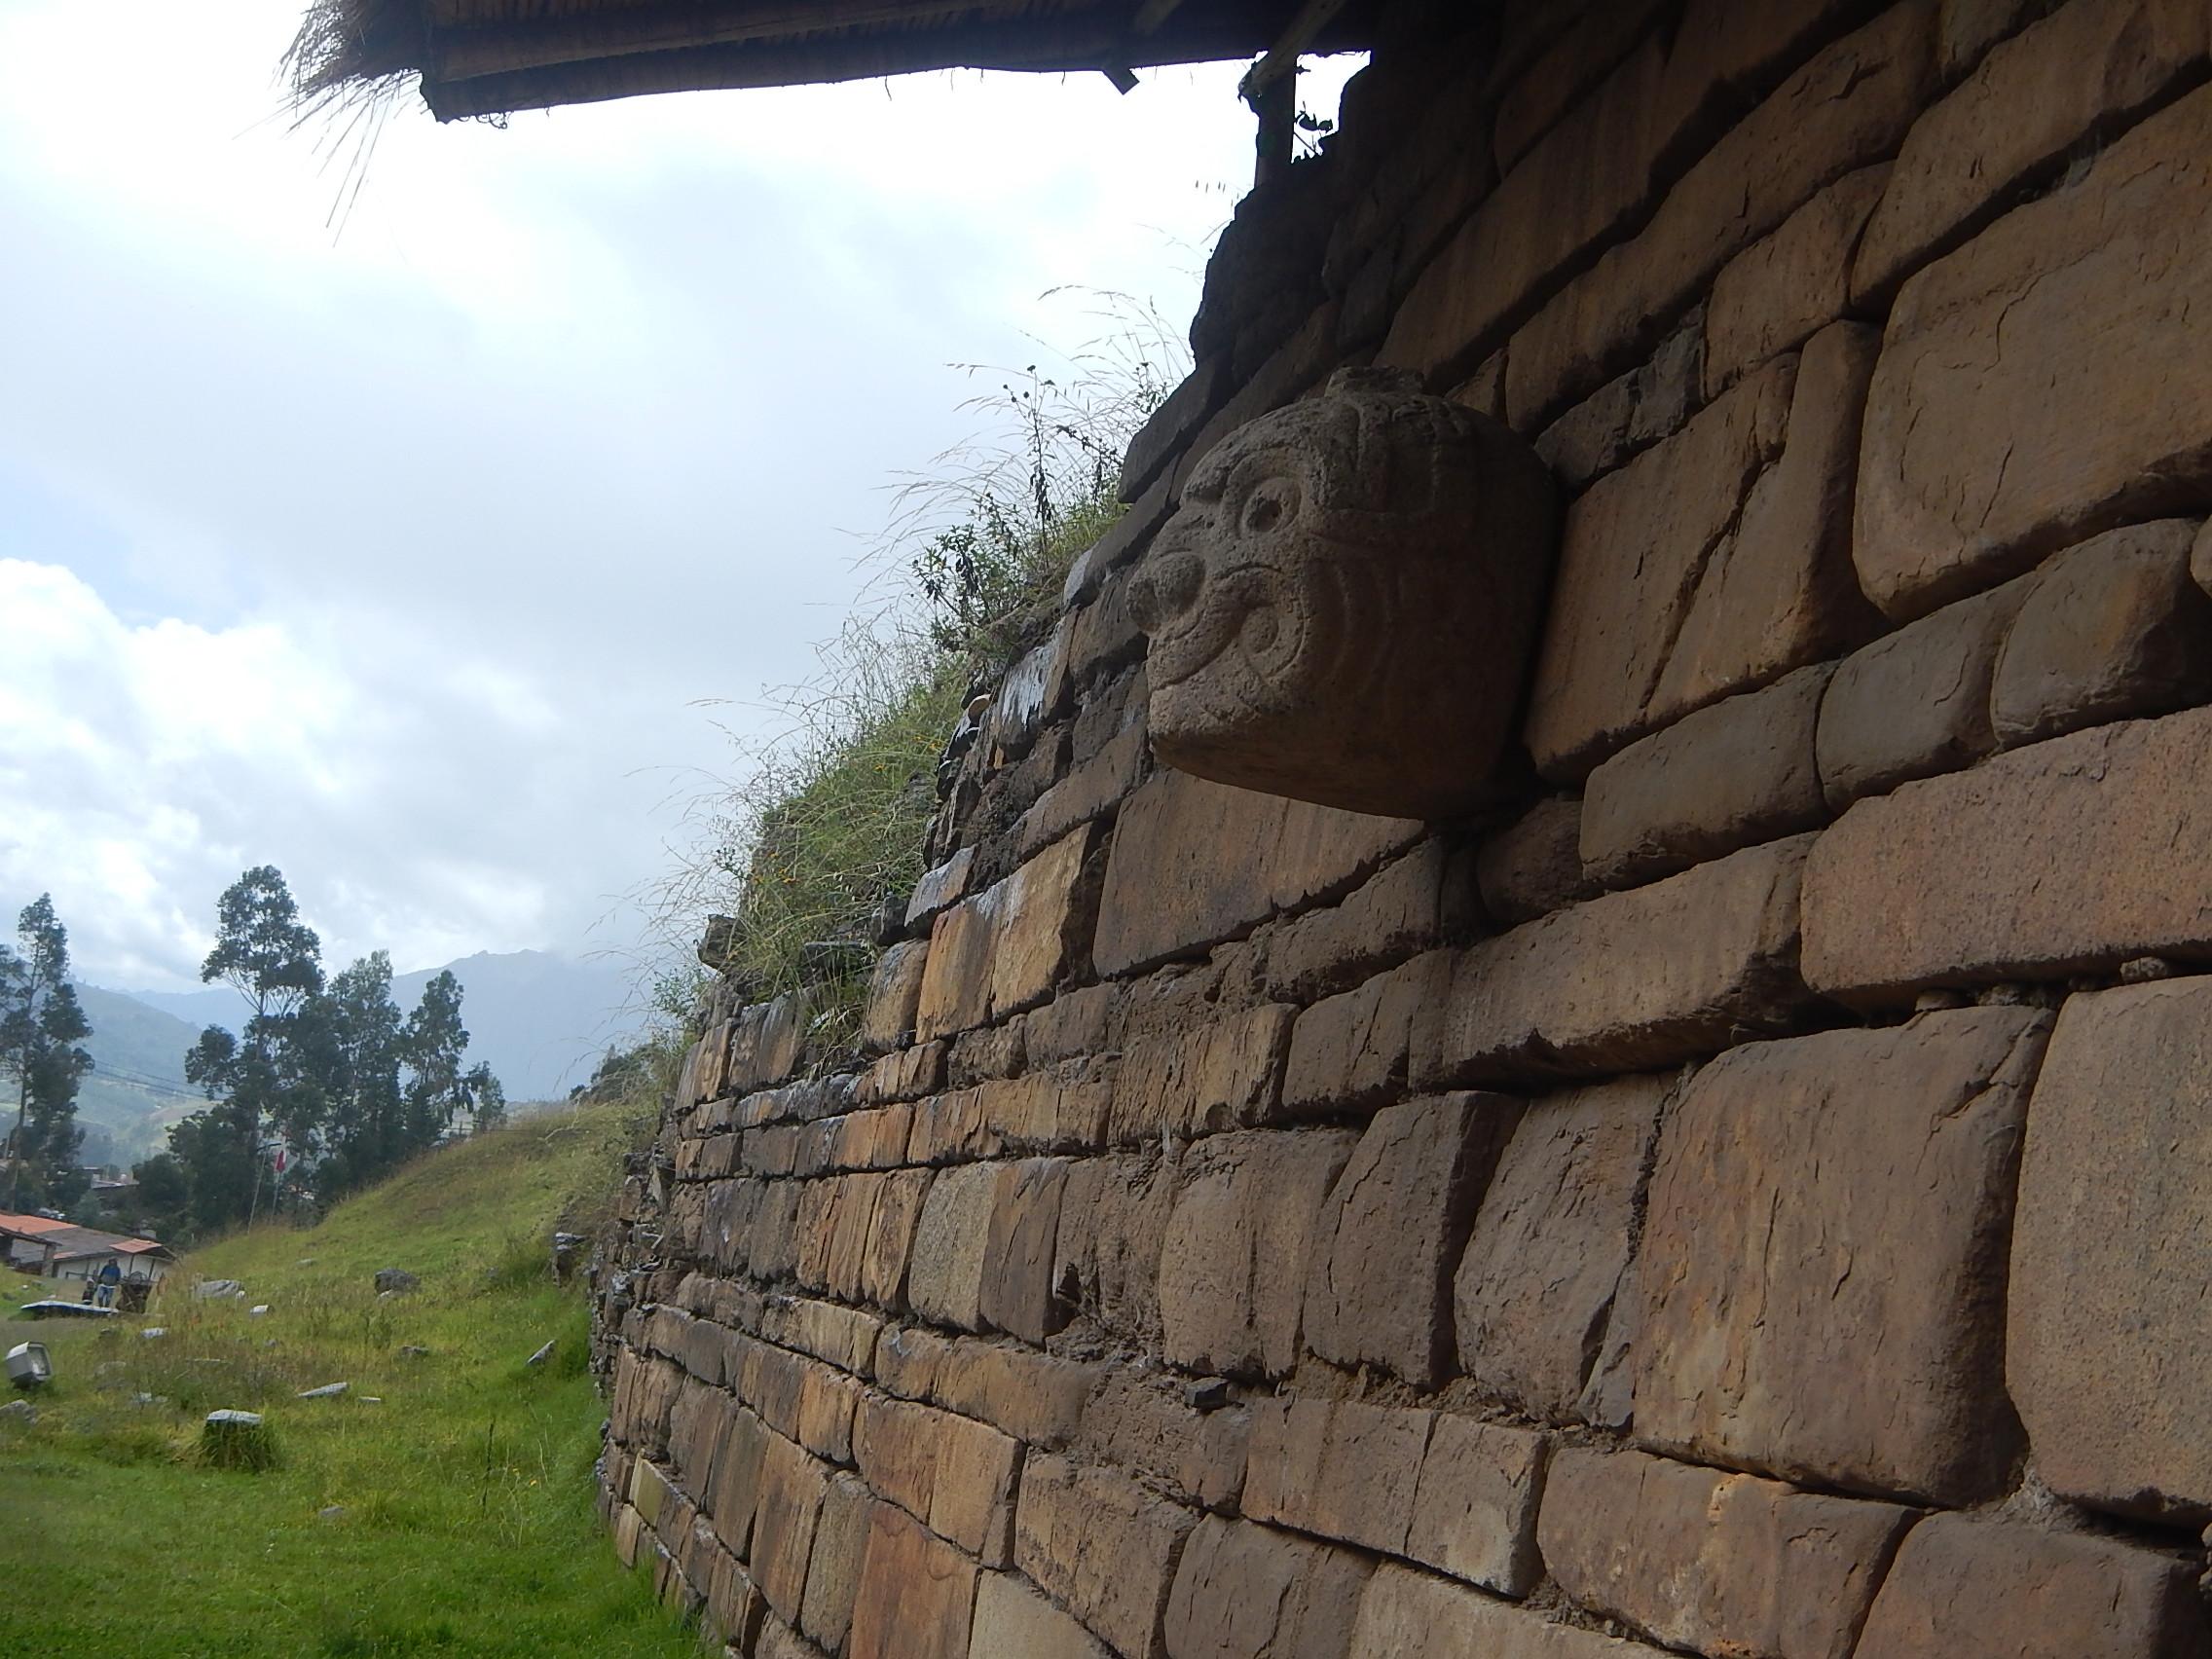 Chavin Head Carving